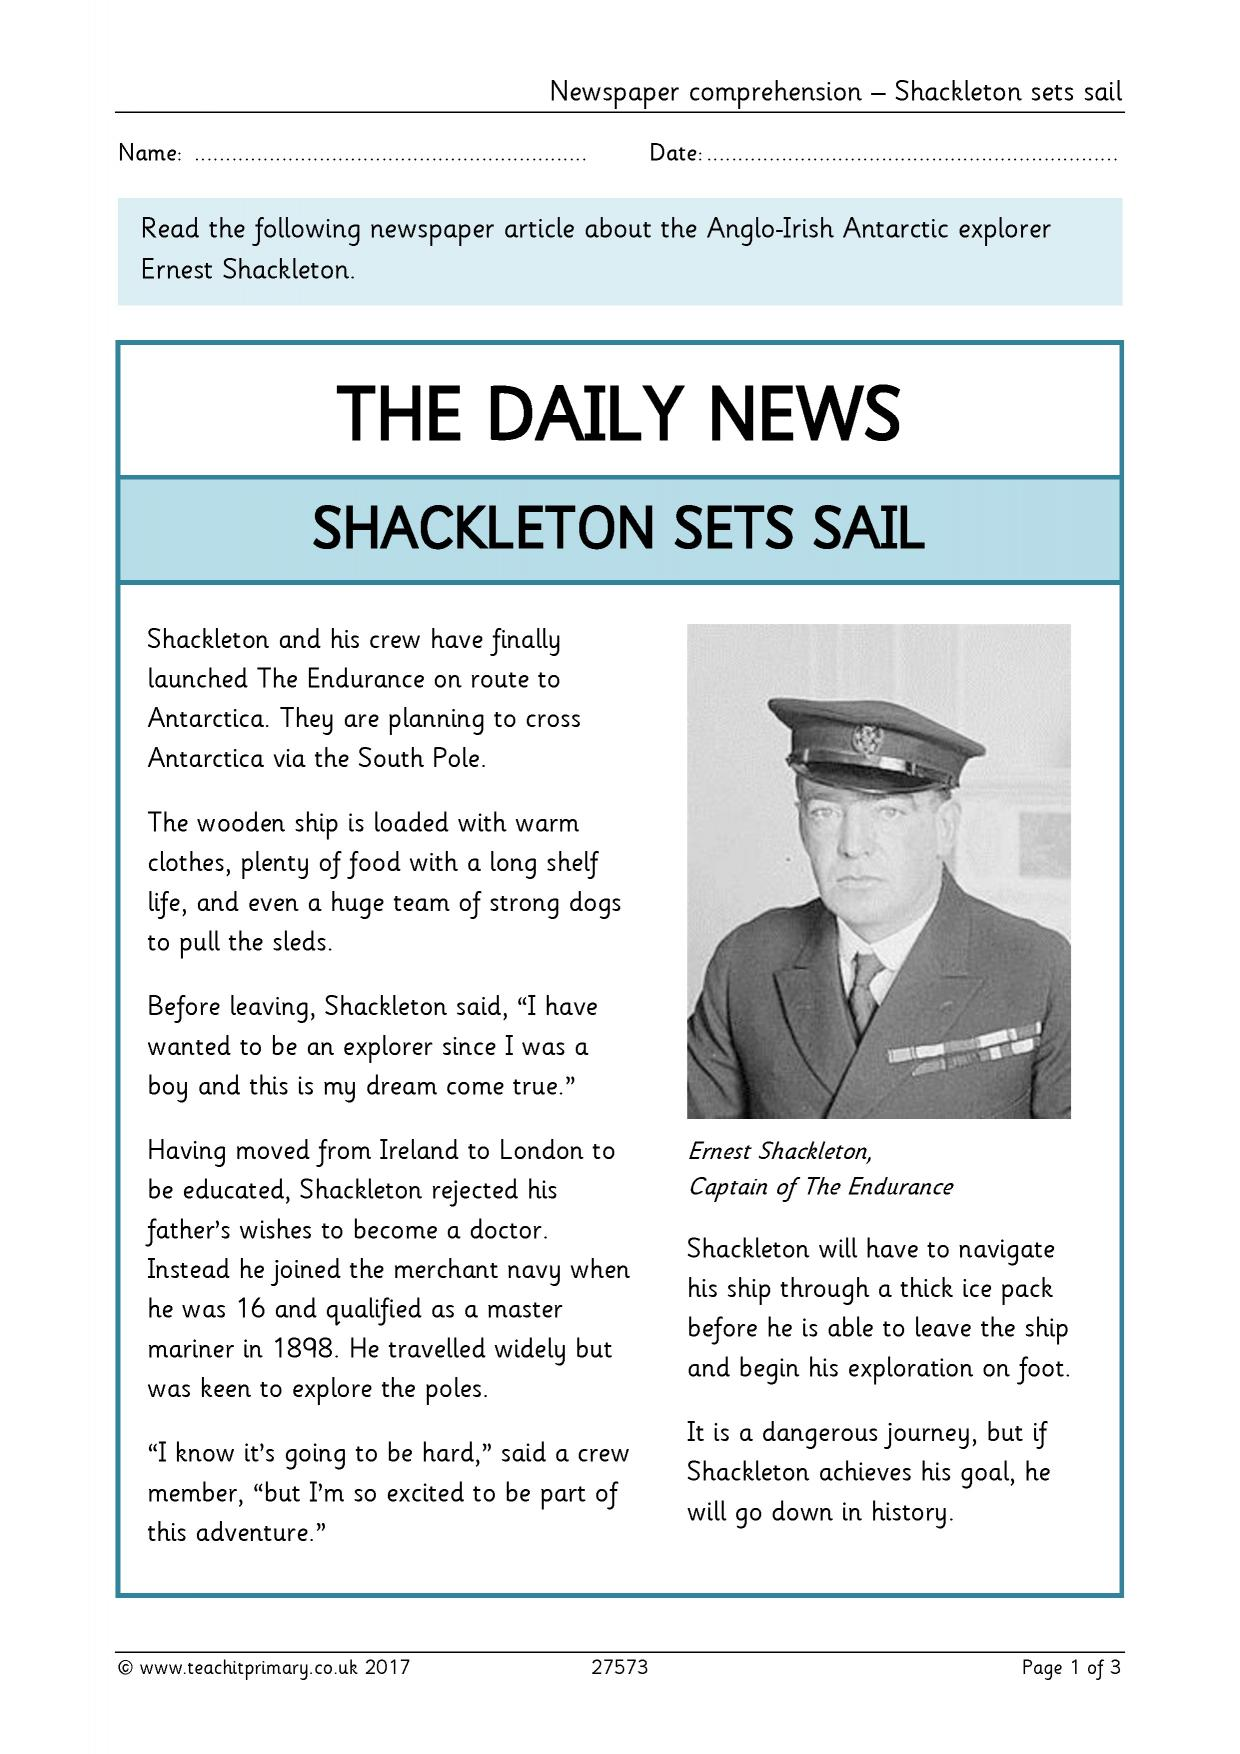 shackleton journal article